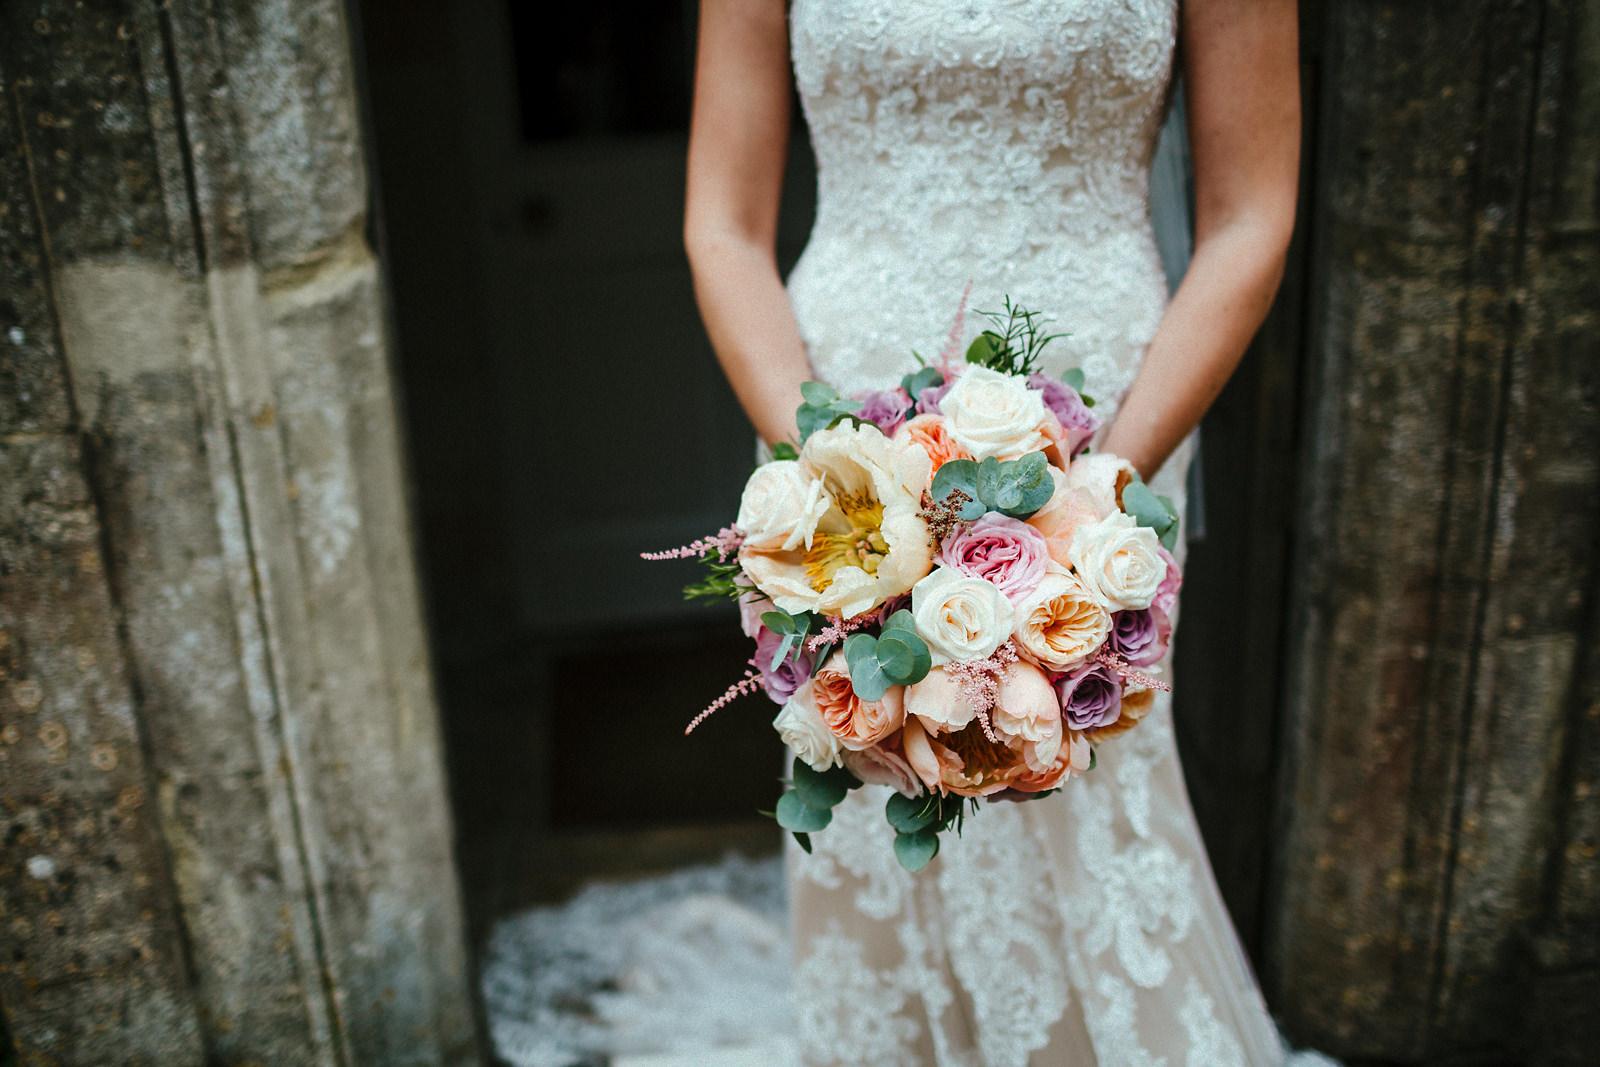 Multicoloured wedding bouquet